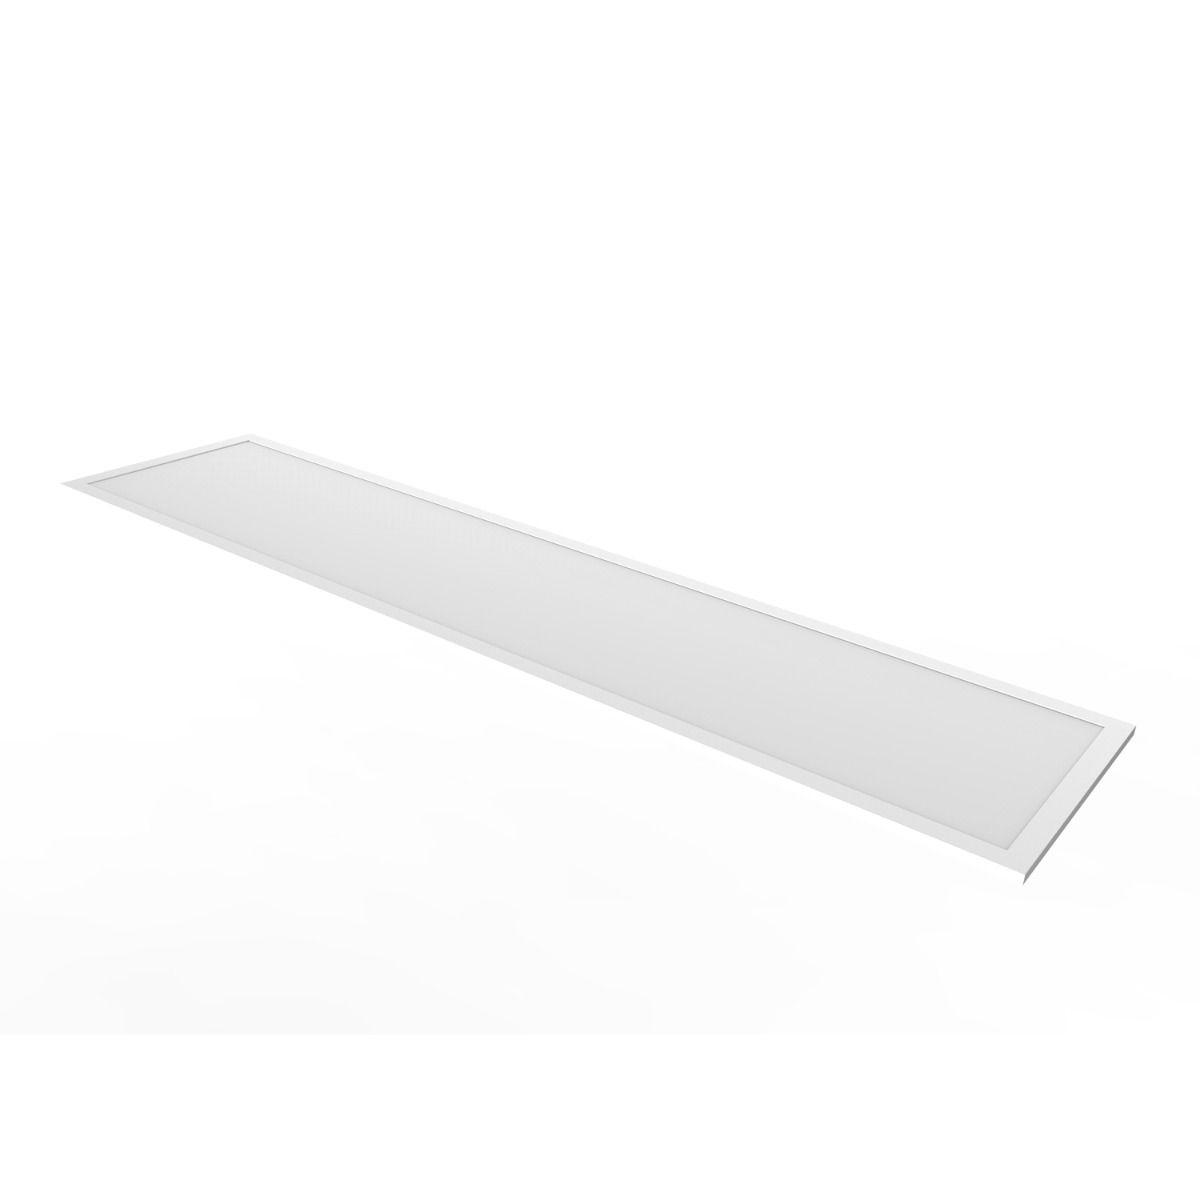 Noxion LED Panel Ecowhite V2.0 30x120cm 6500K 36W UGR <19 | Tageslichtweiß - Ersatz für 2x36W